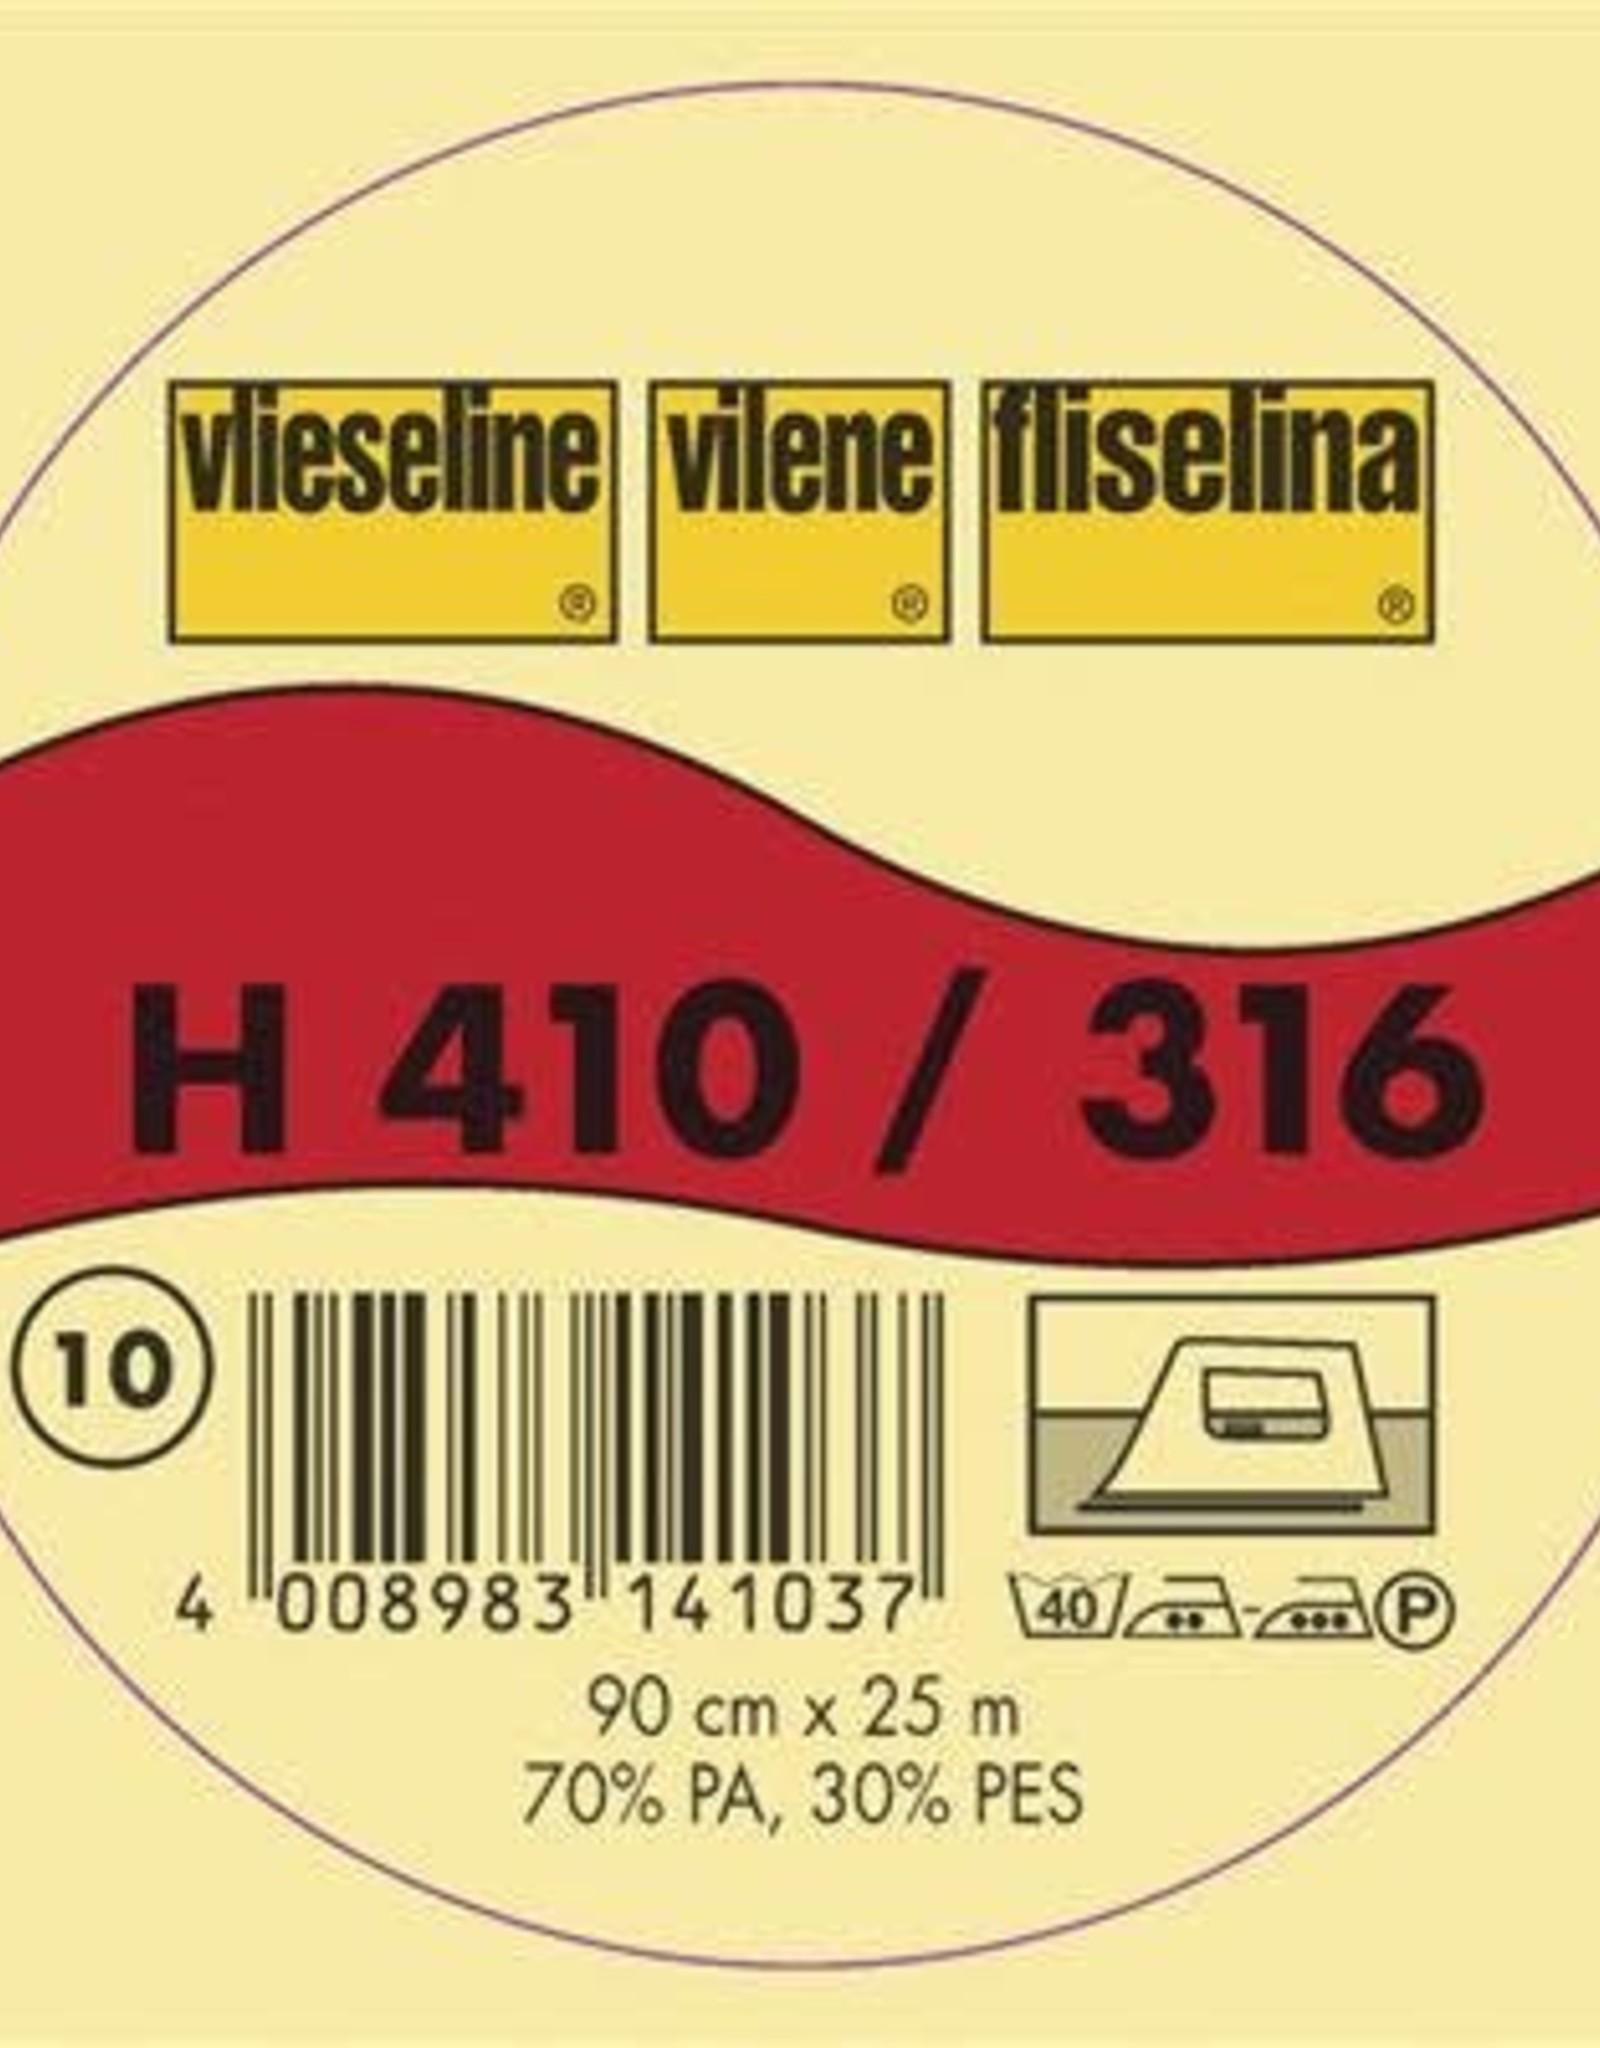 Vlieseline H410 PLAKBARE TUSSENVOERING WIT 90cm